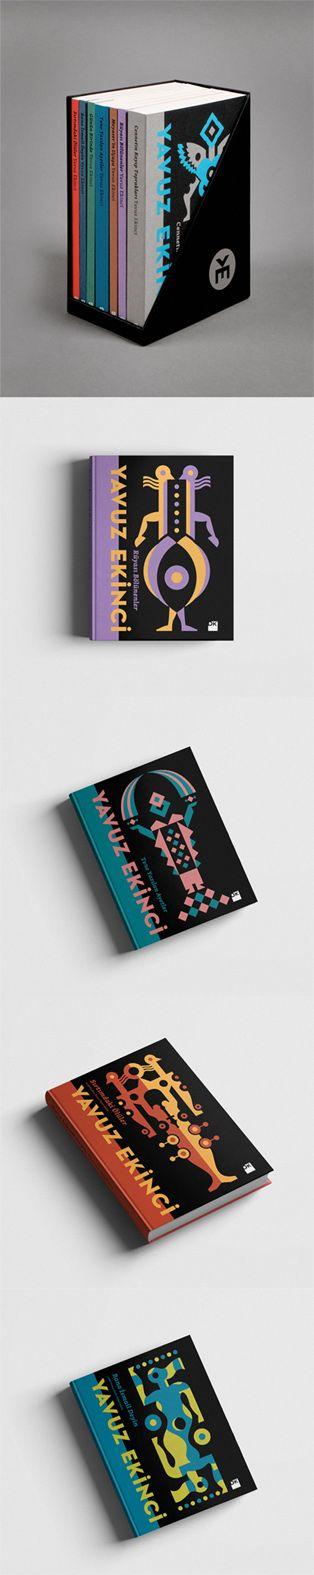 Book Cover Series by Geray Gencer www.geraygencer.com  Europen Design Awards Winner